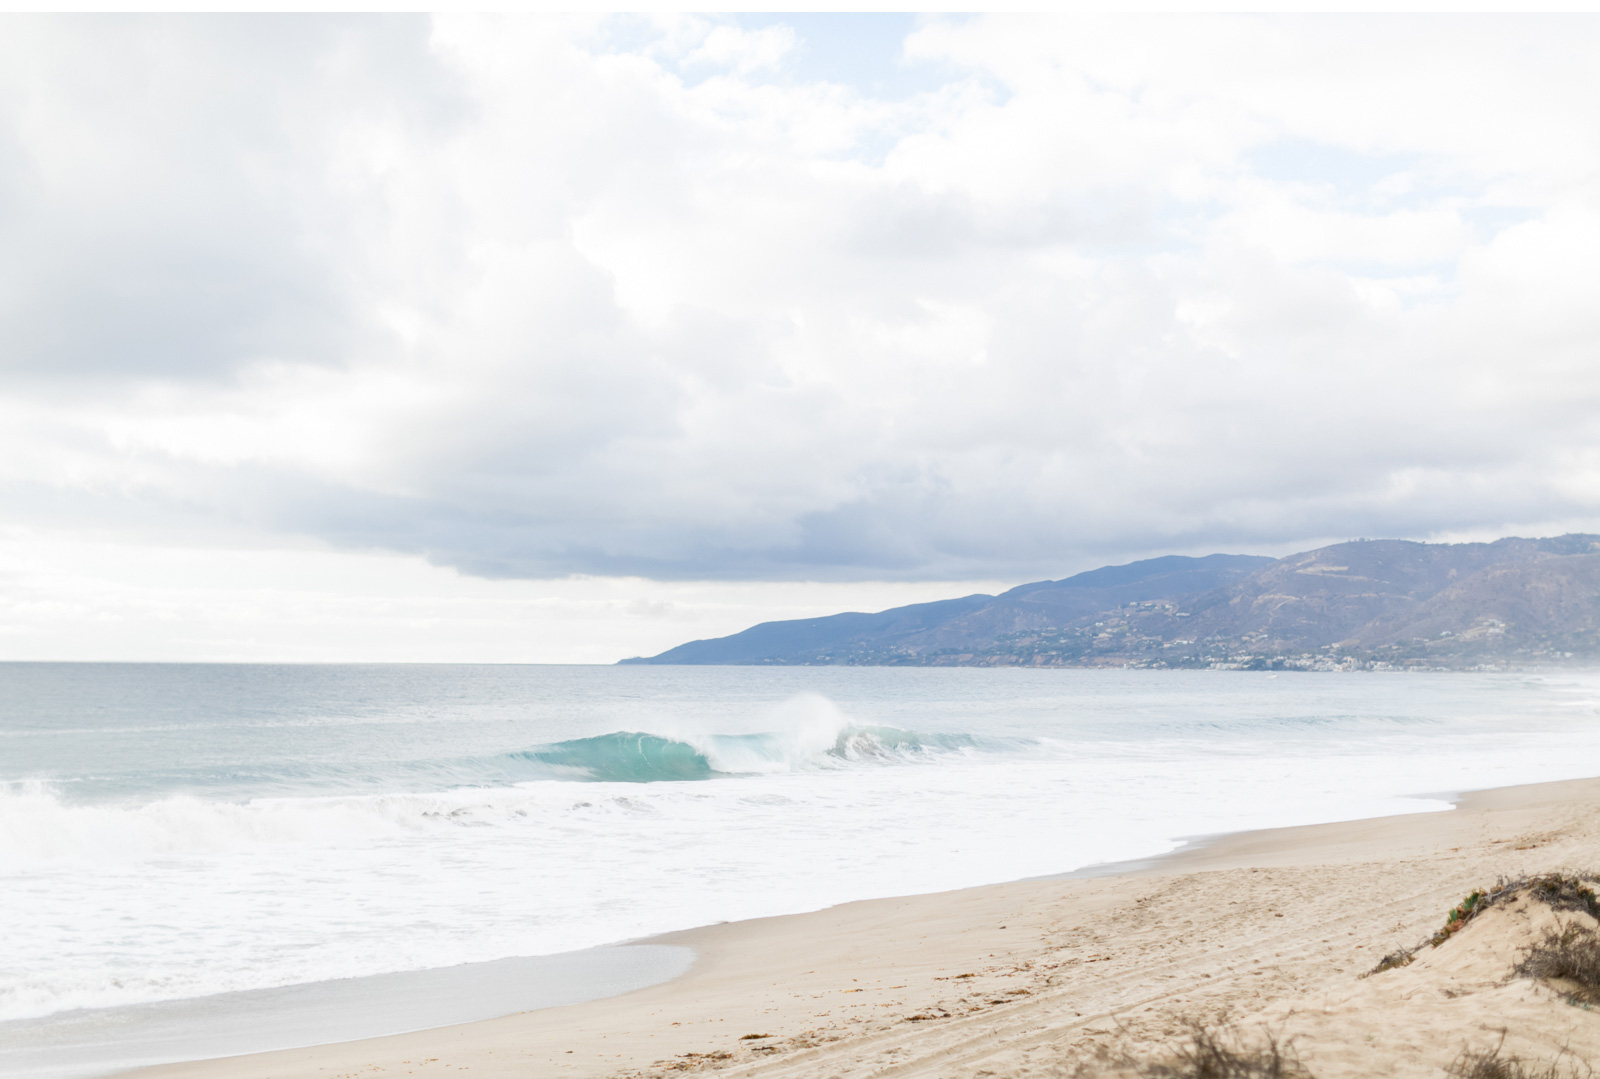 Malibu-First-Look-Natalie-Schutt-Photography-Rod-Brewster_02.jpg